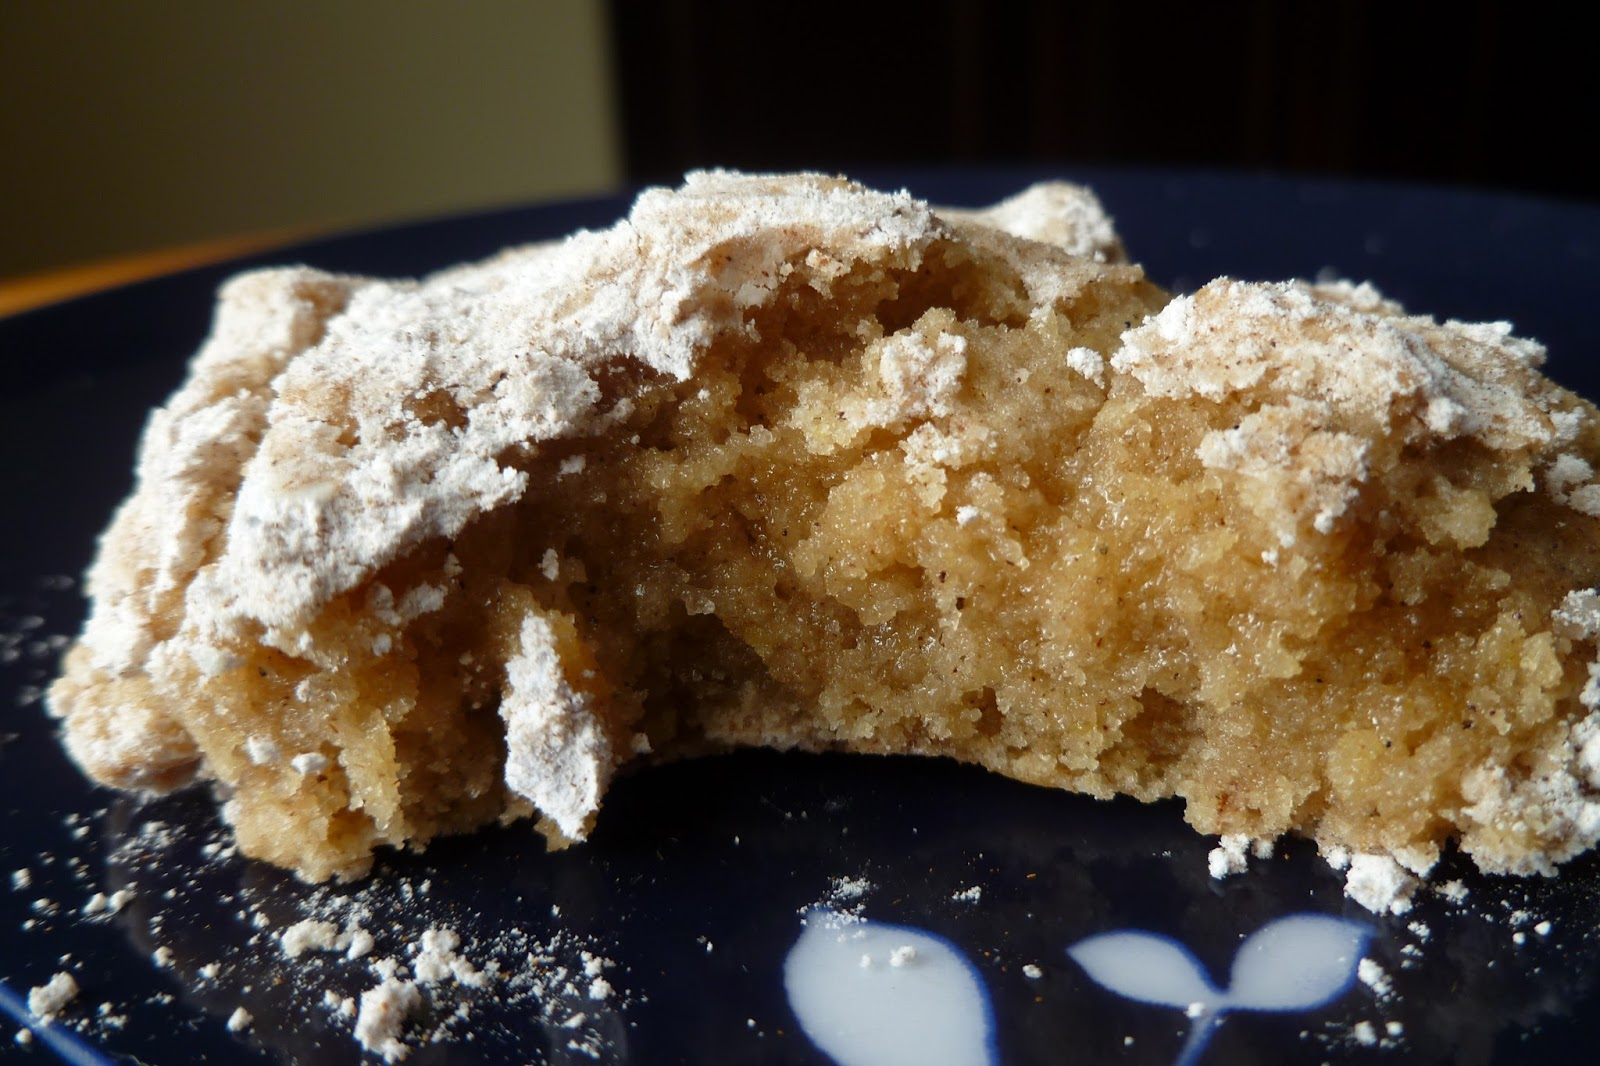 recipe: 1 cup granulated sugar to powdered sugar [25]